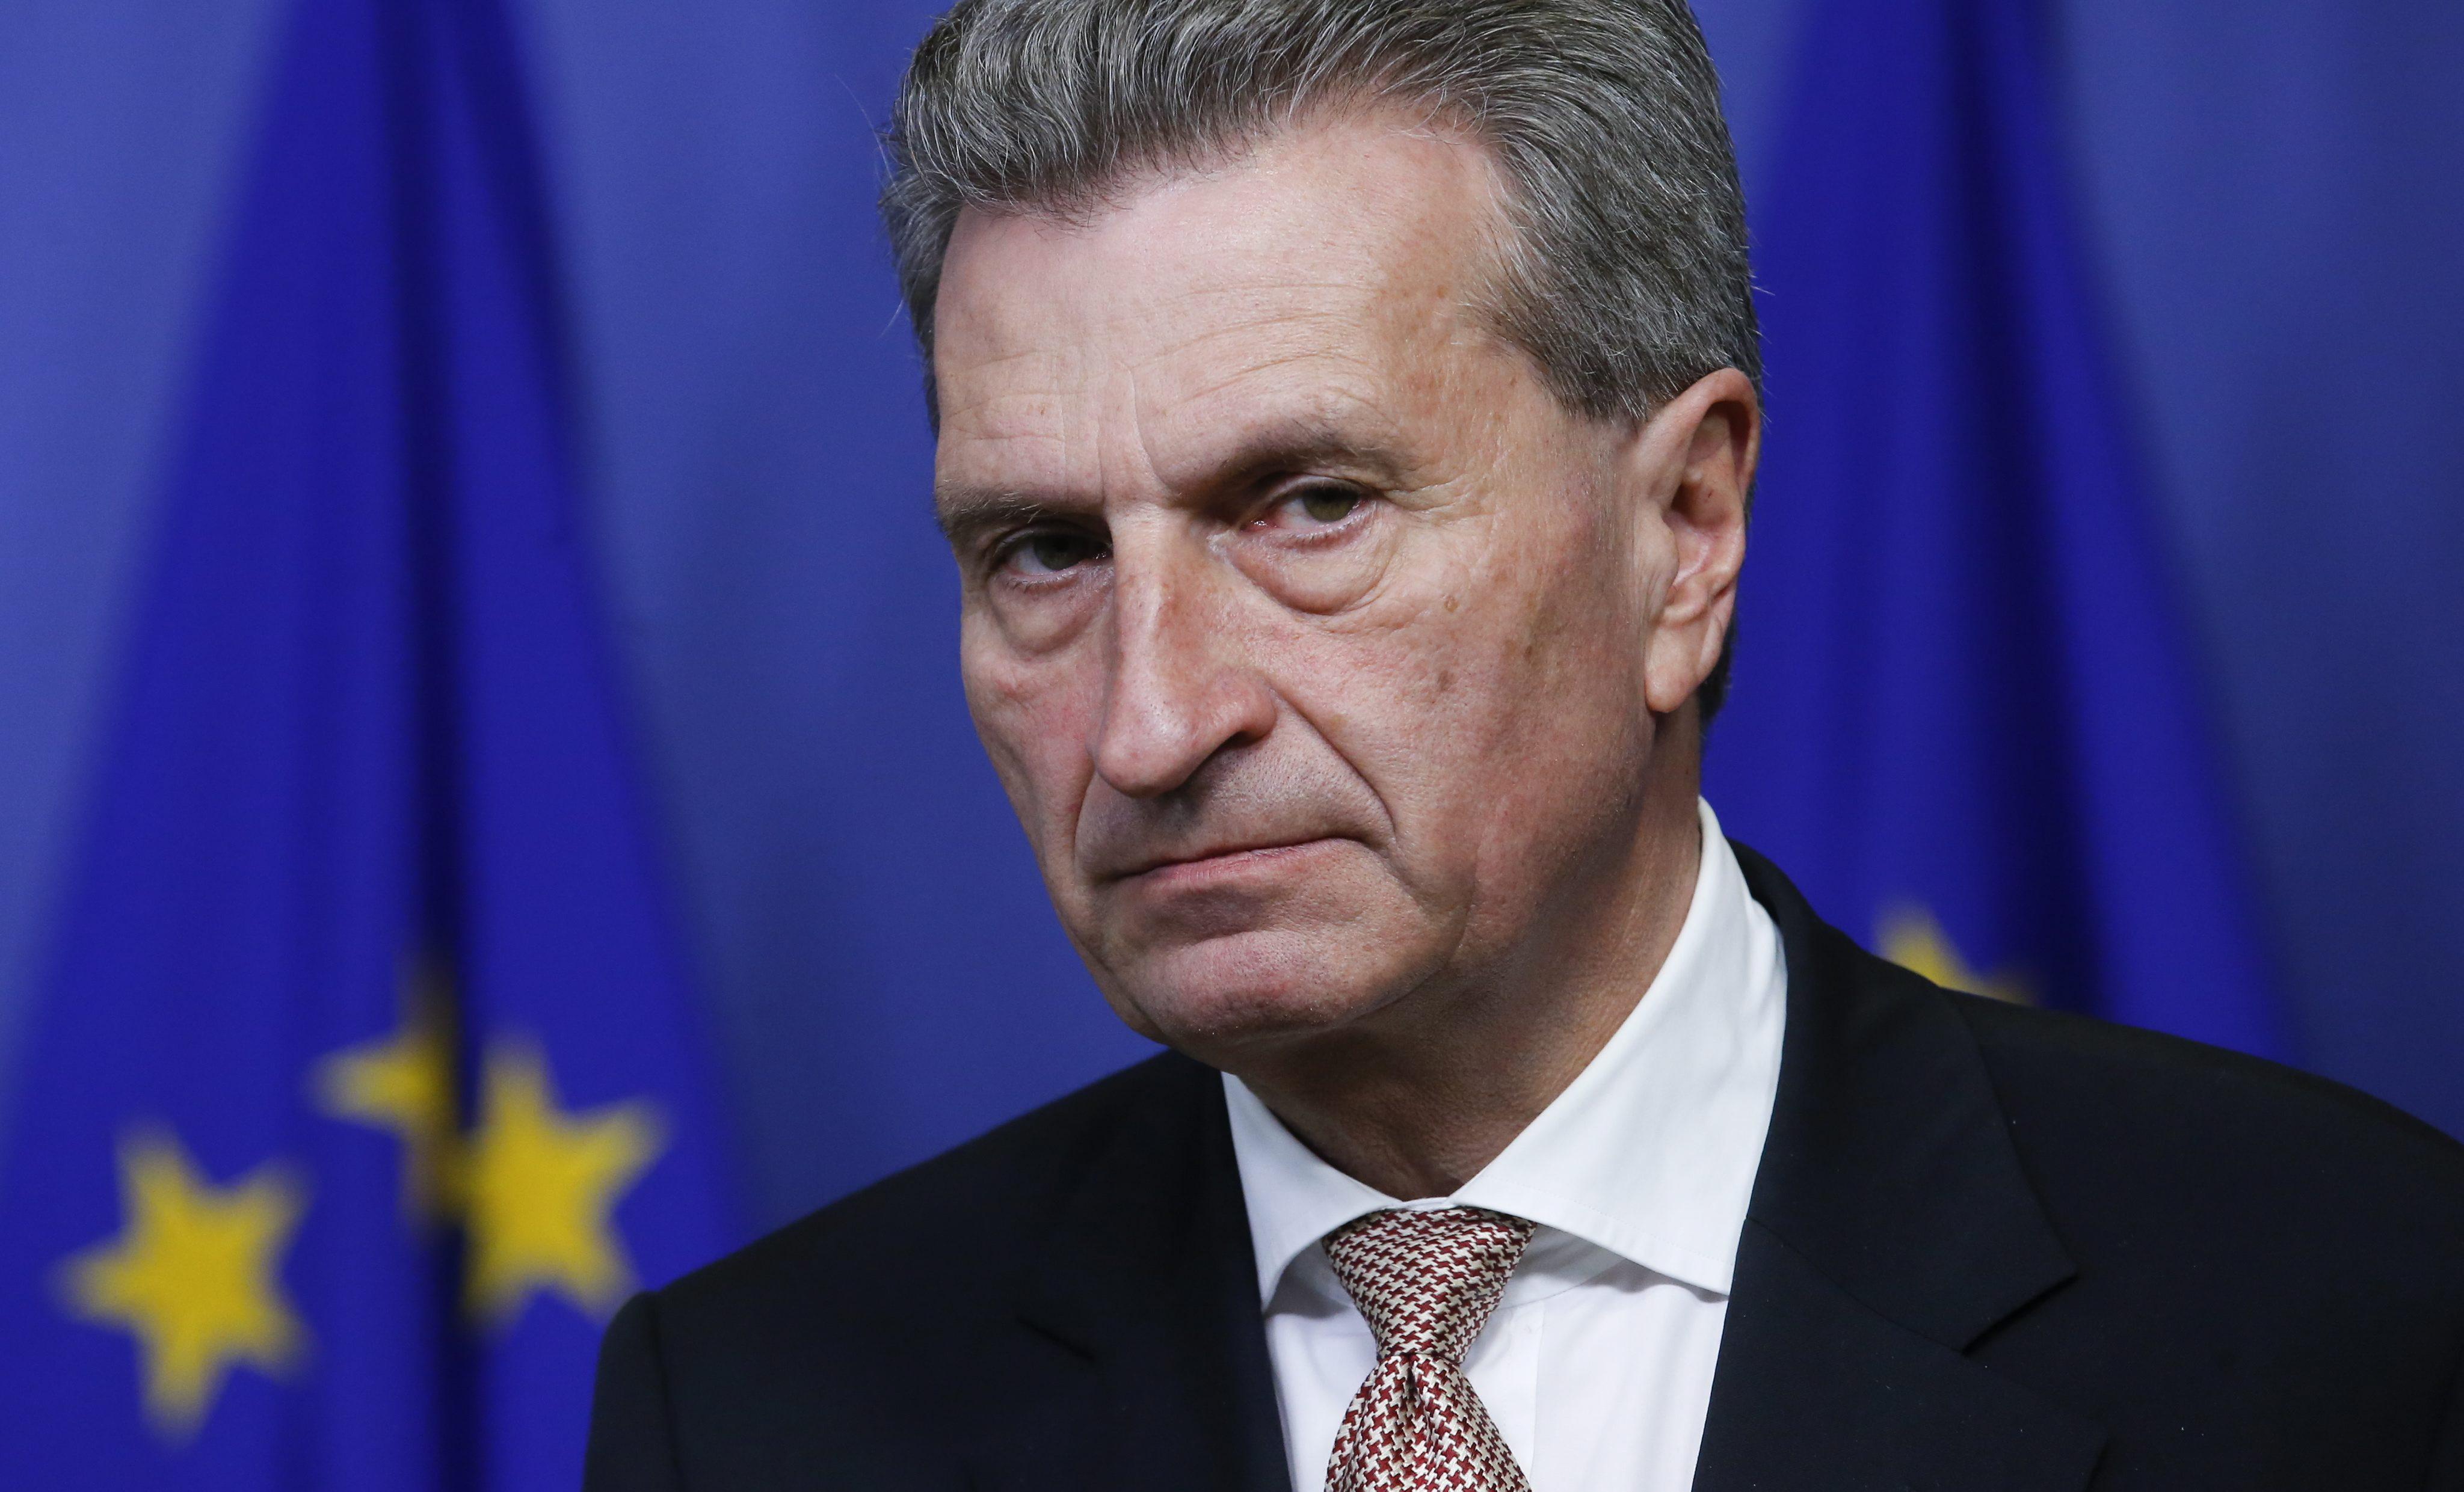 EU-Kommission, Günther Oettinger, Klaus Mangold, Lobbyismus,